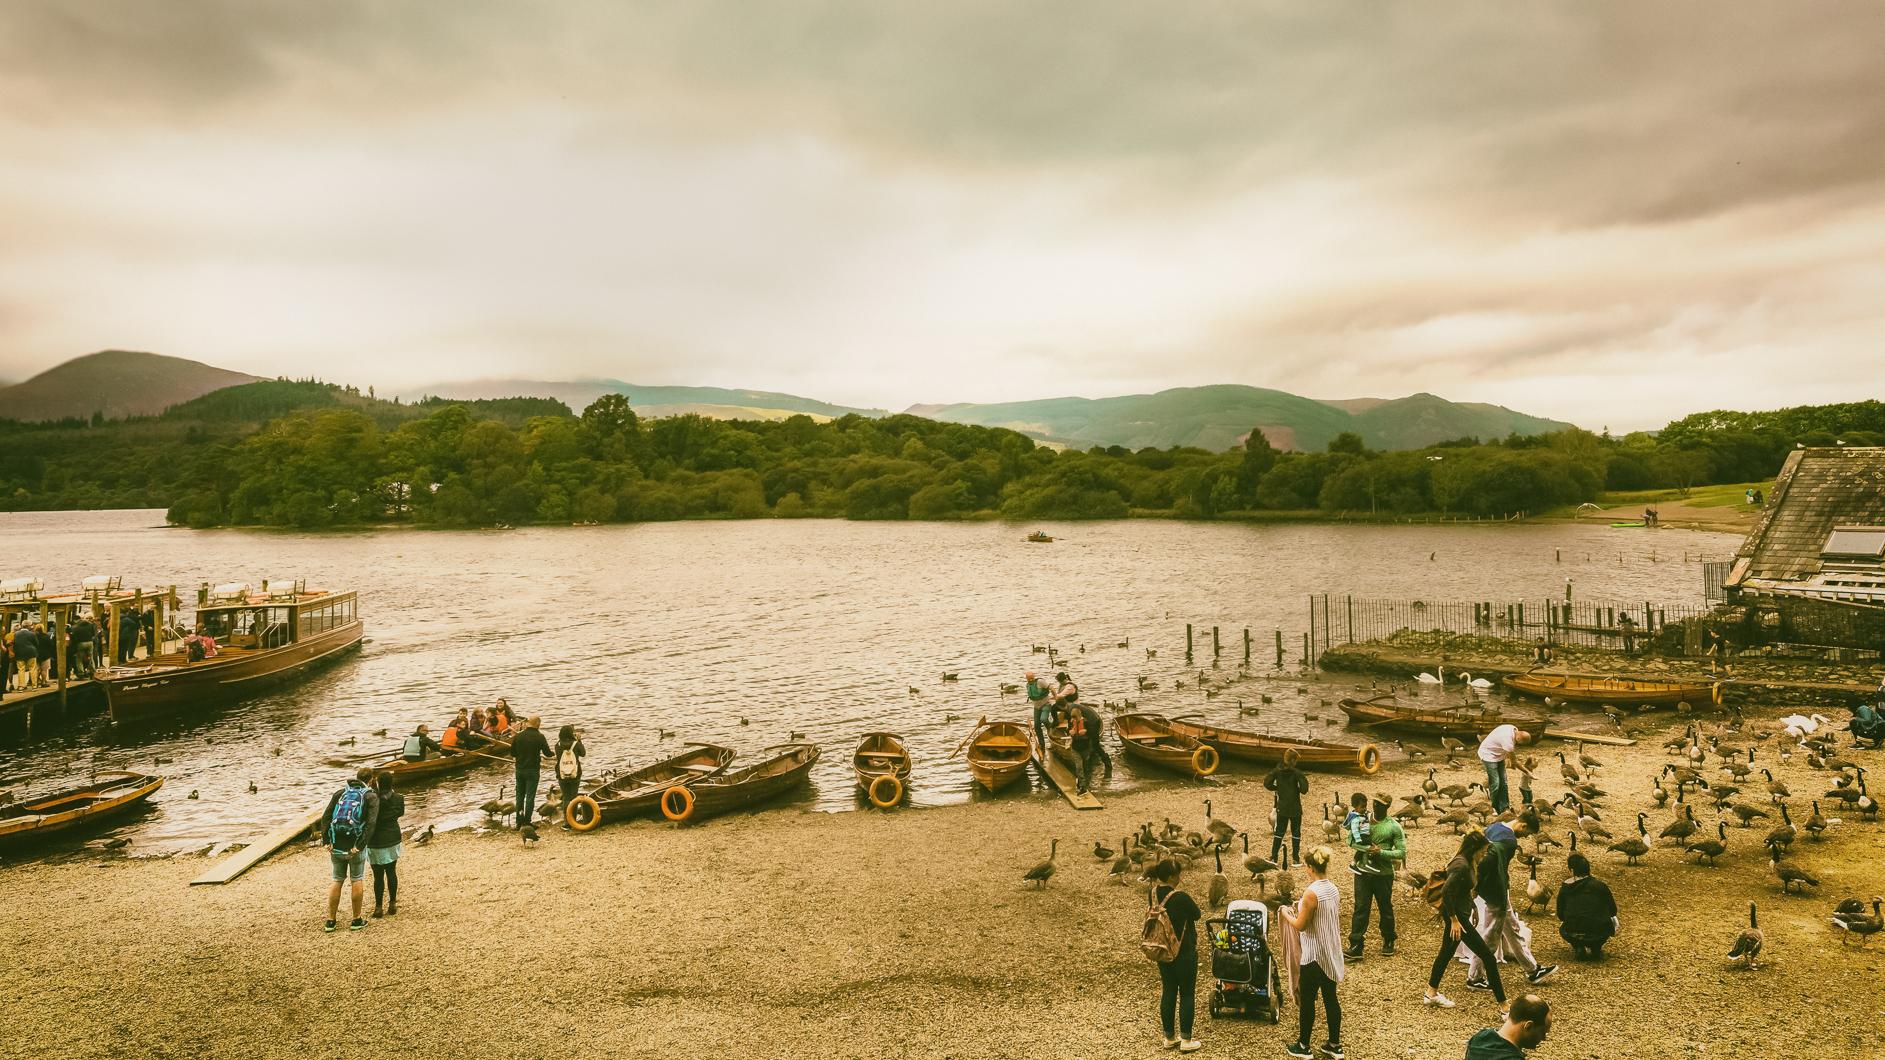 At the Lake, Carlisle, Cumbria, UK